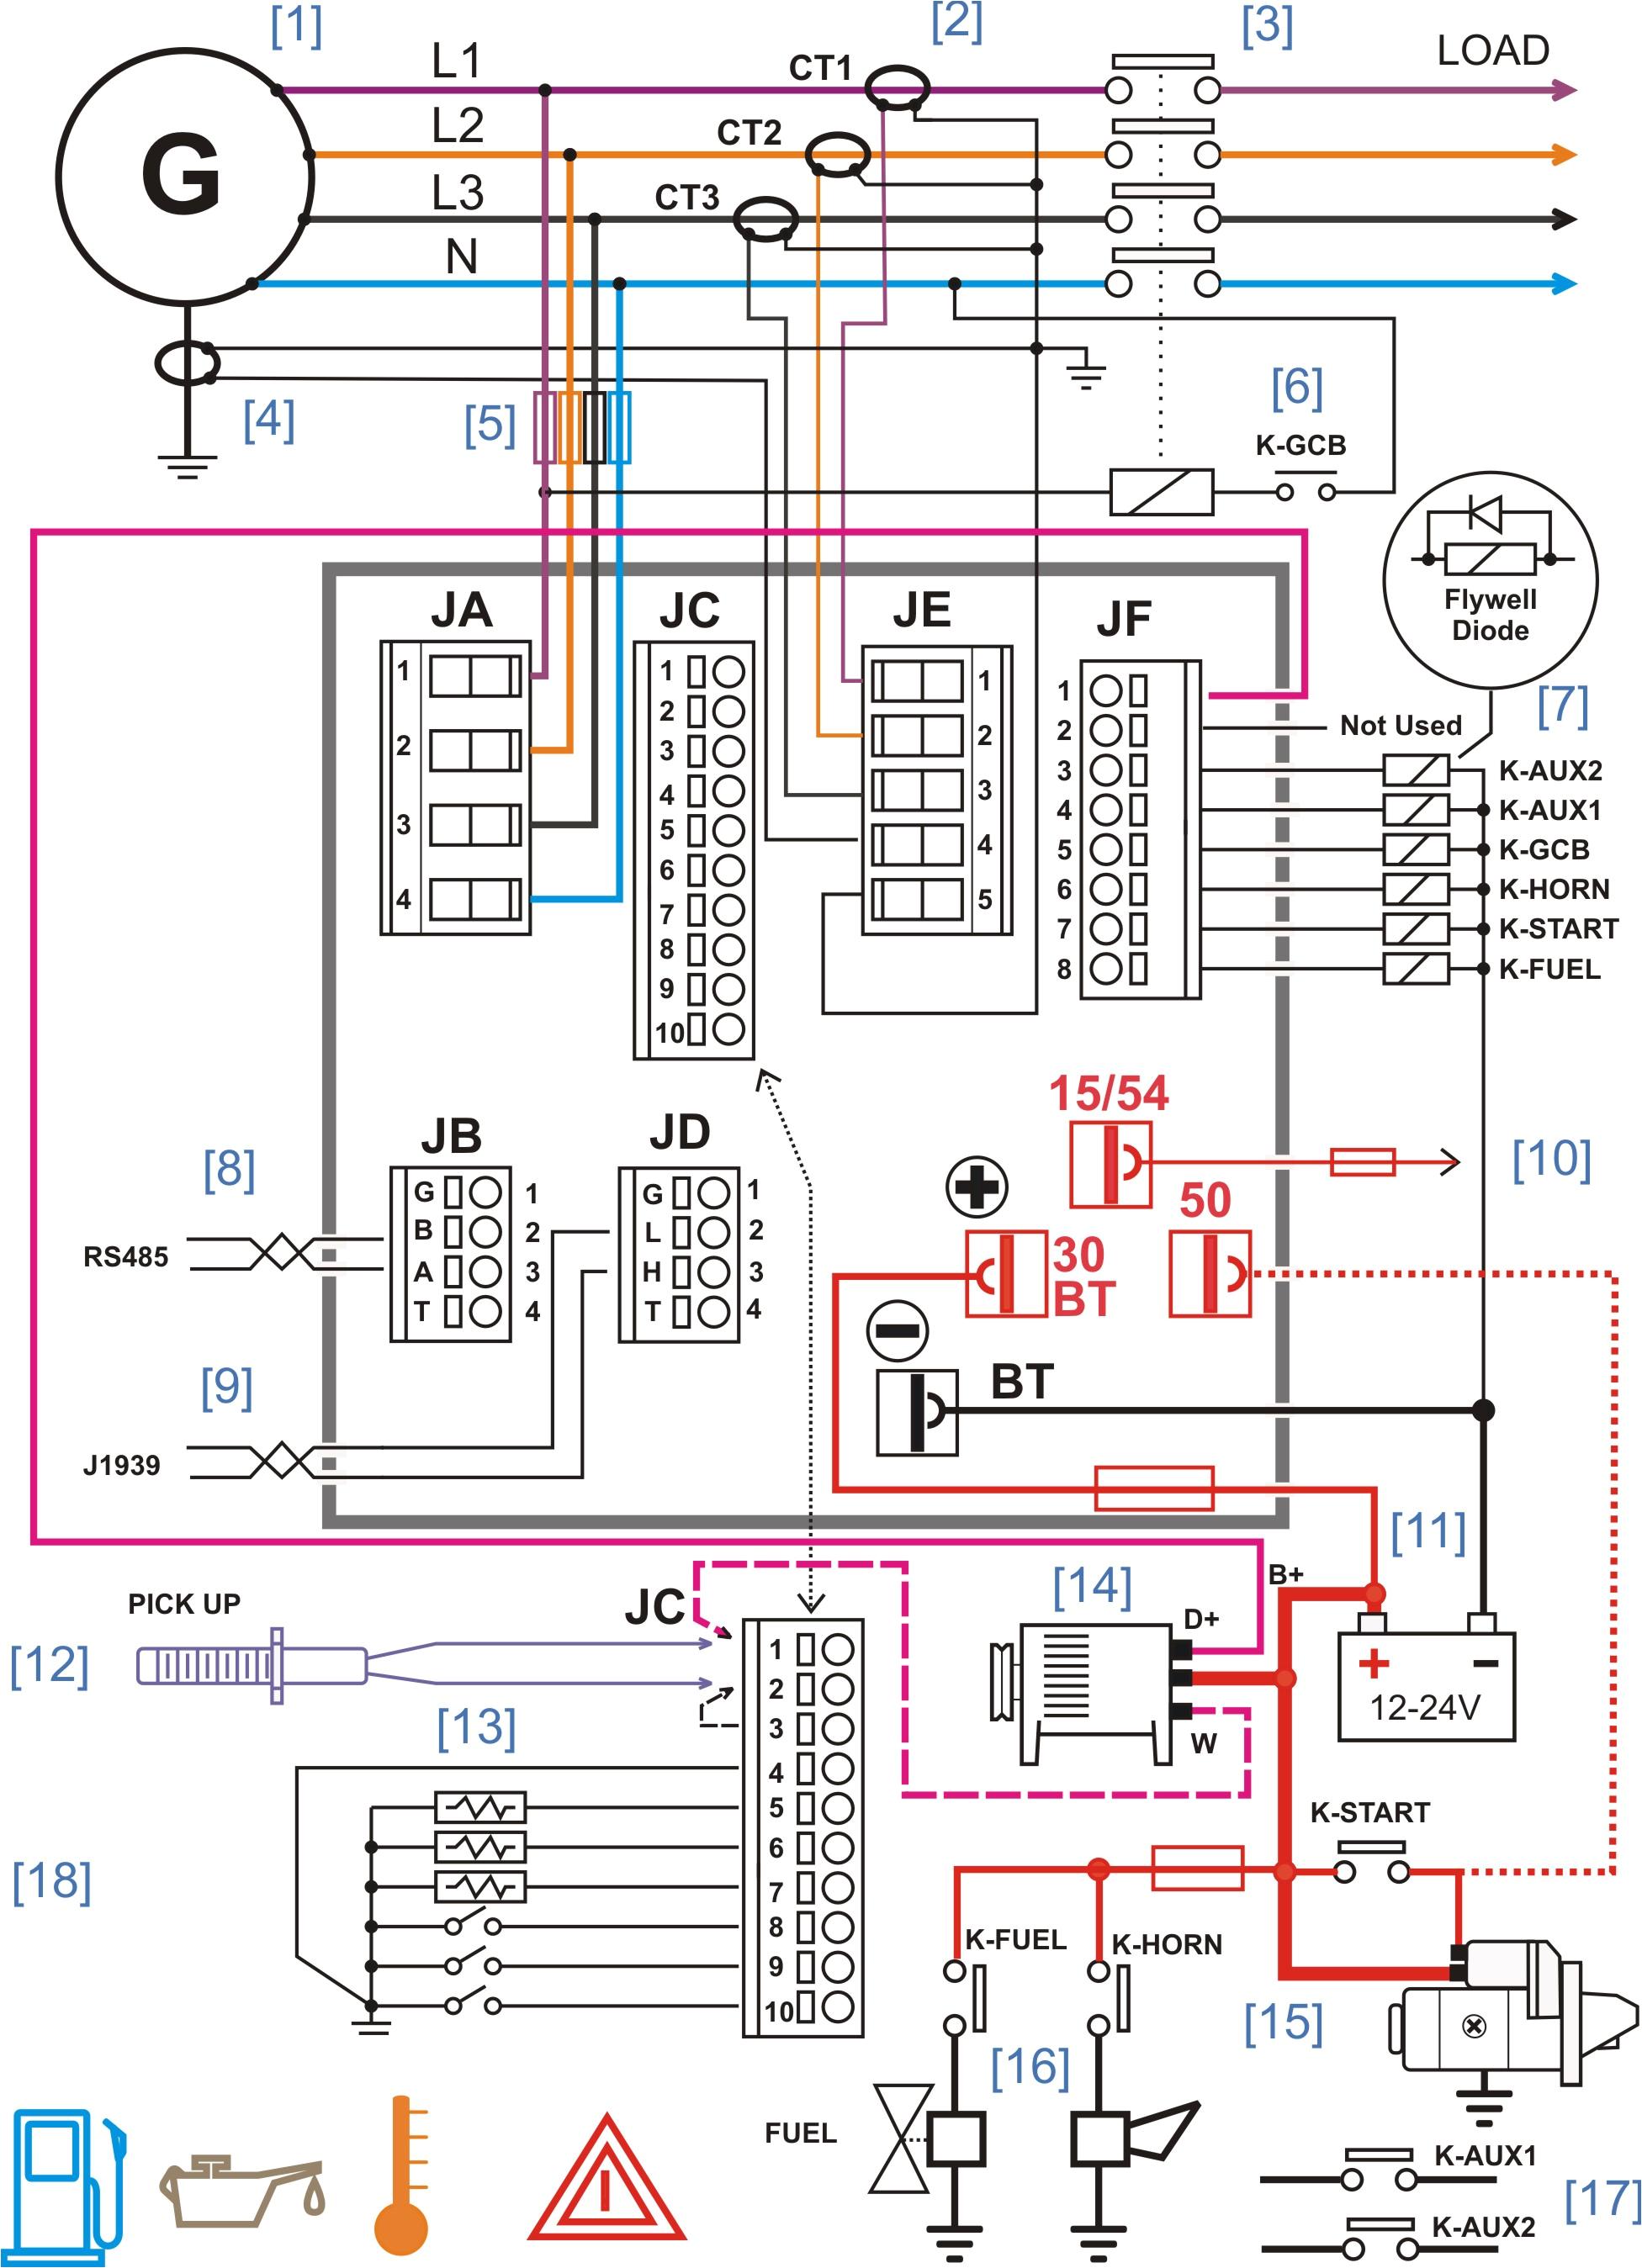 electrical diagram online wiring diagram pagewiring diagram online creator wiring diagram name electrical block diagram online